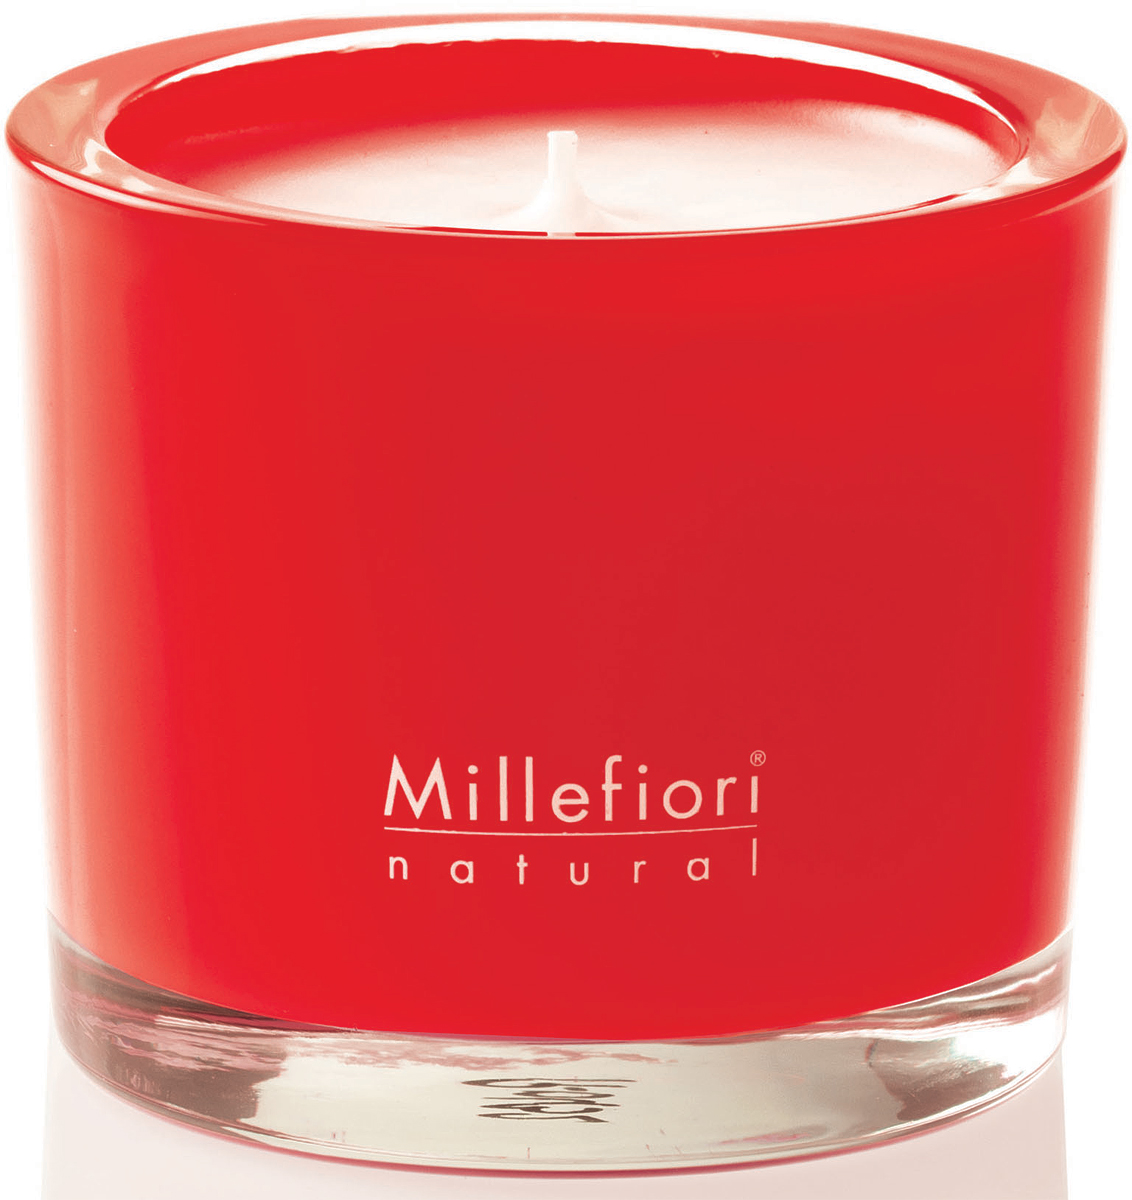 Cвеча ароматическая Millefiori Milano Яблоко и корица / Mela & Canela, 180 г духи спрей для дома millefiori milano natural яблоко и корица mela